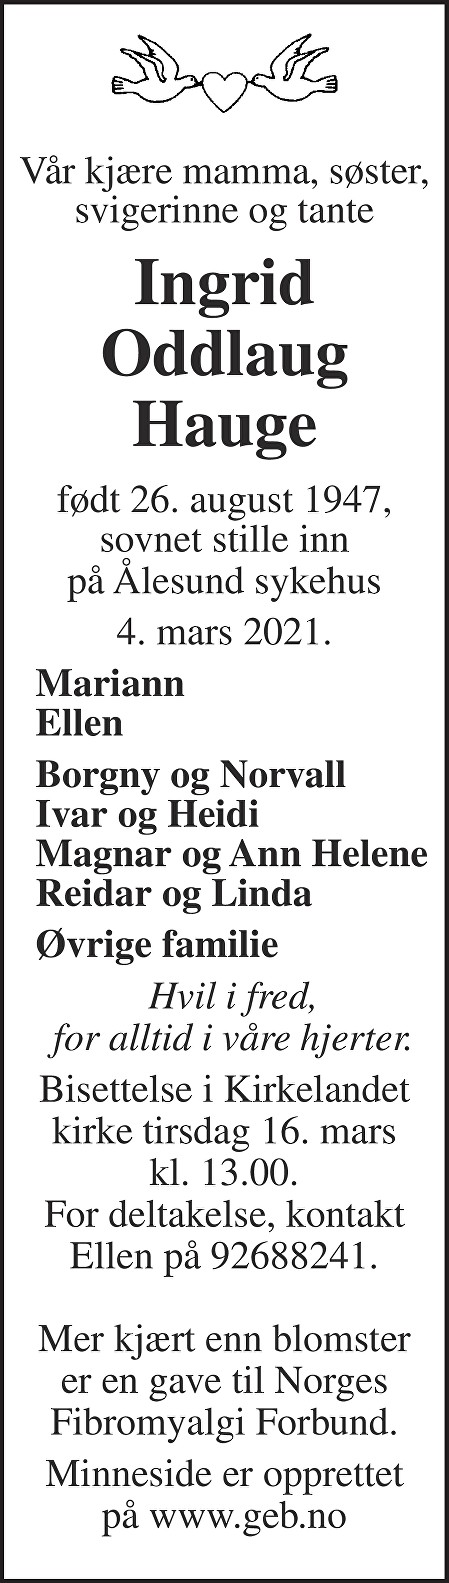 Ingrid Oddlaug Hauge Dødsannonse